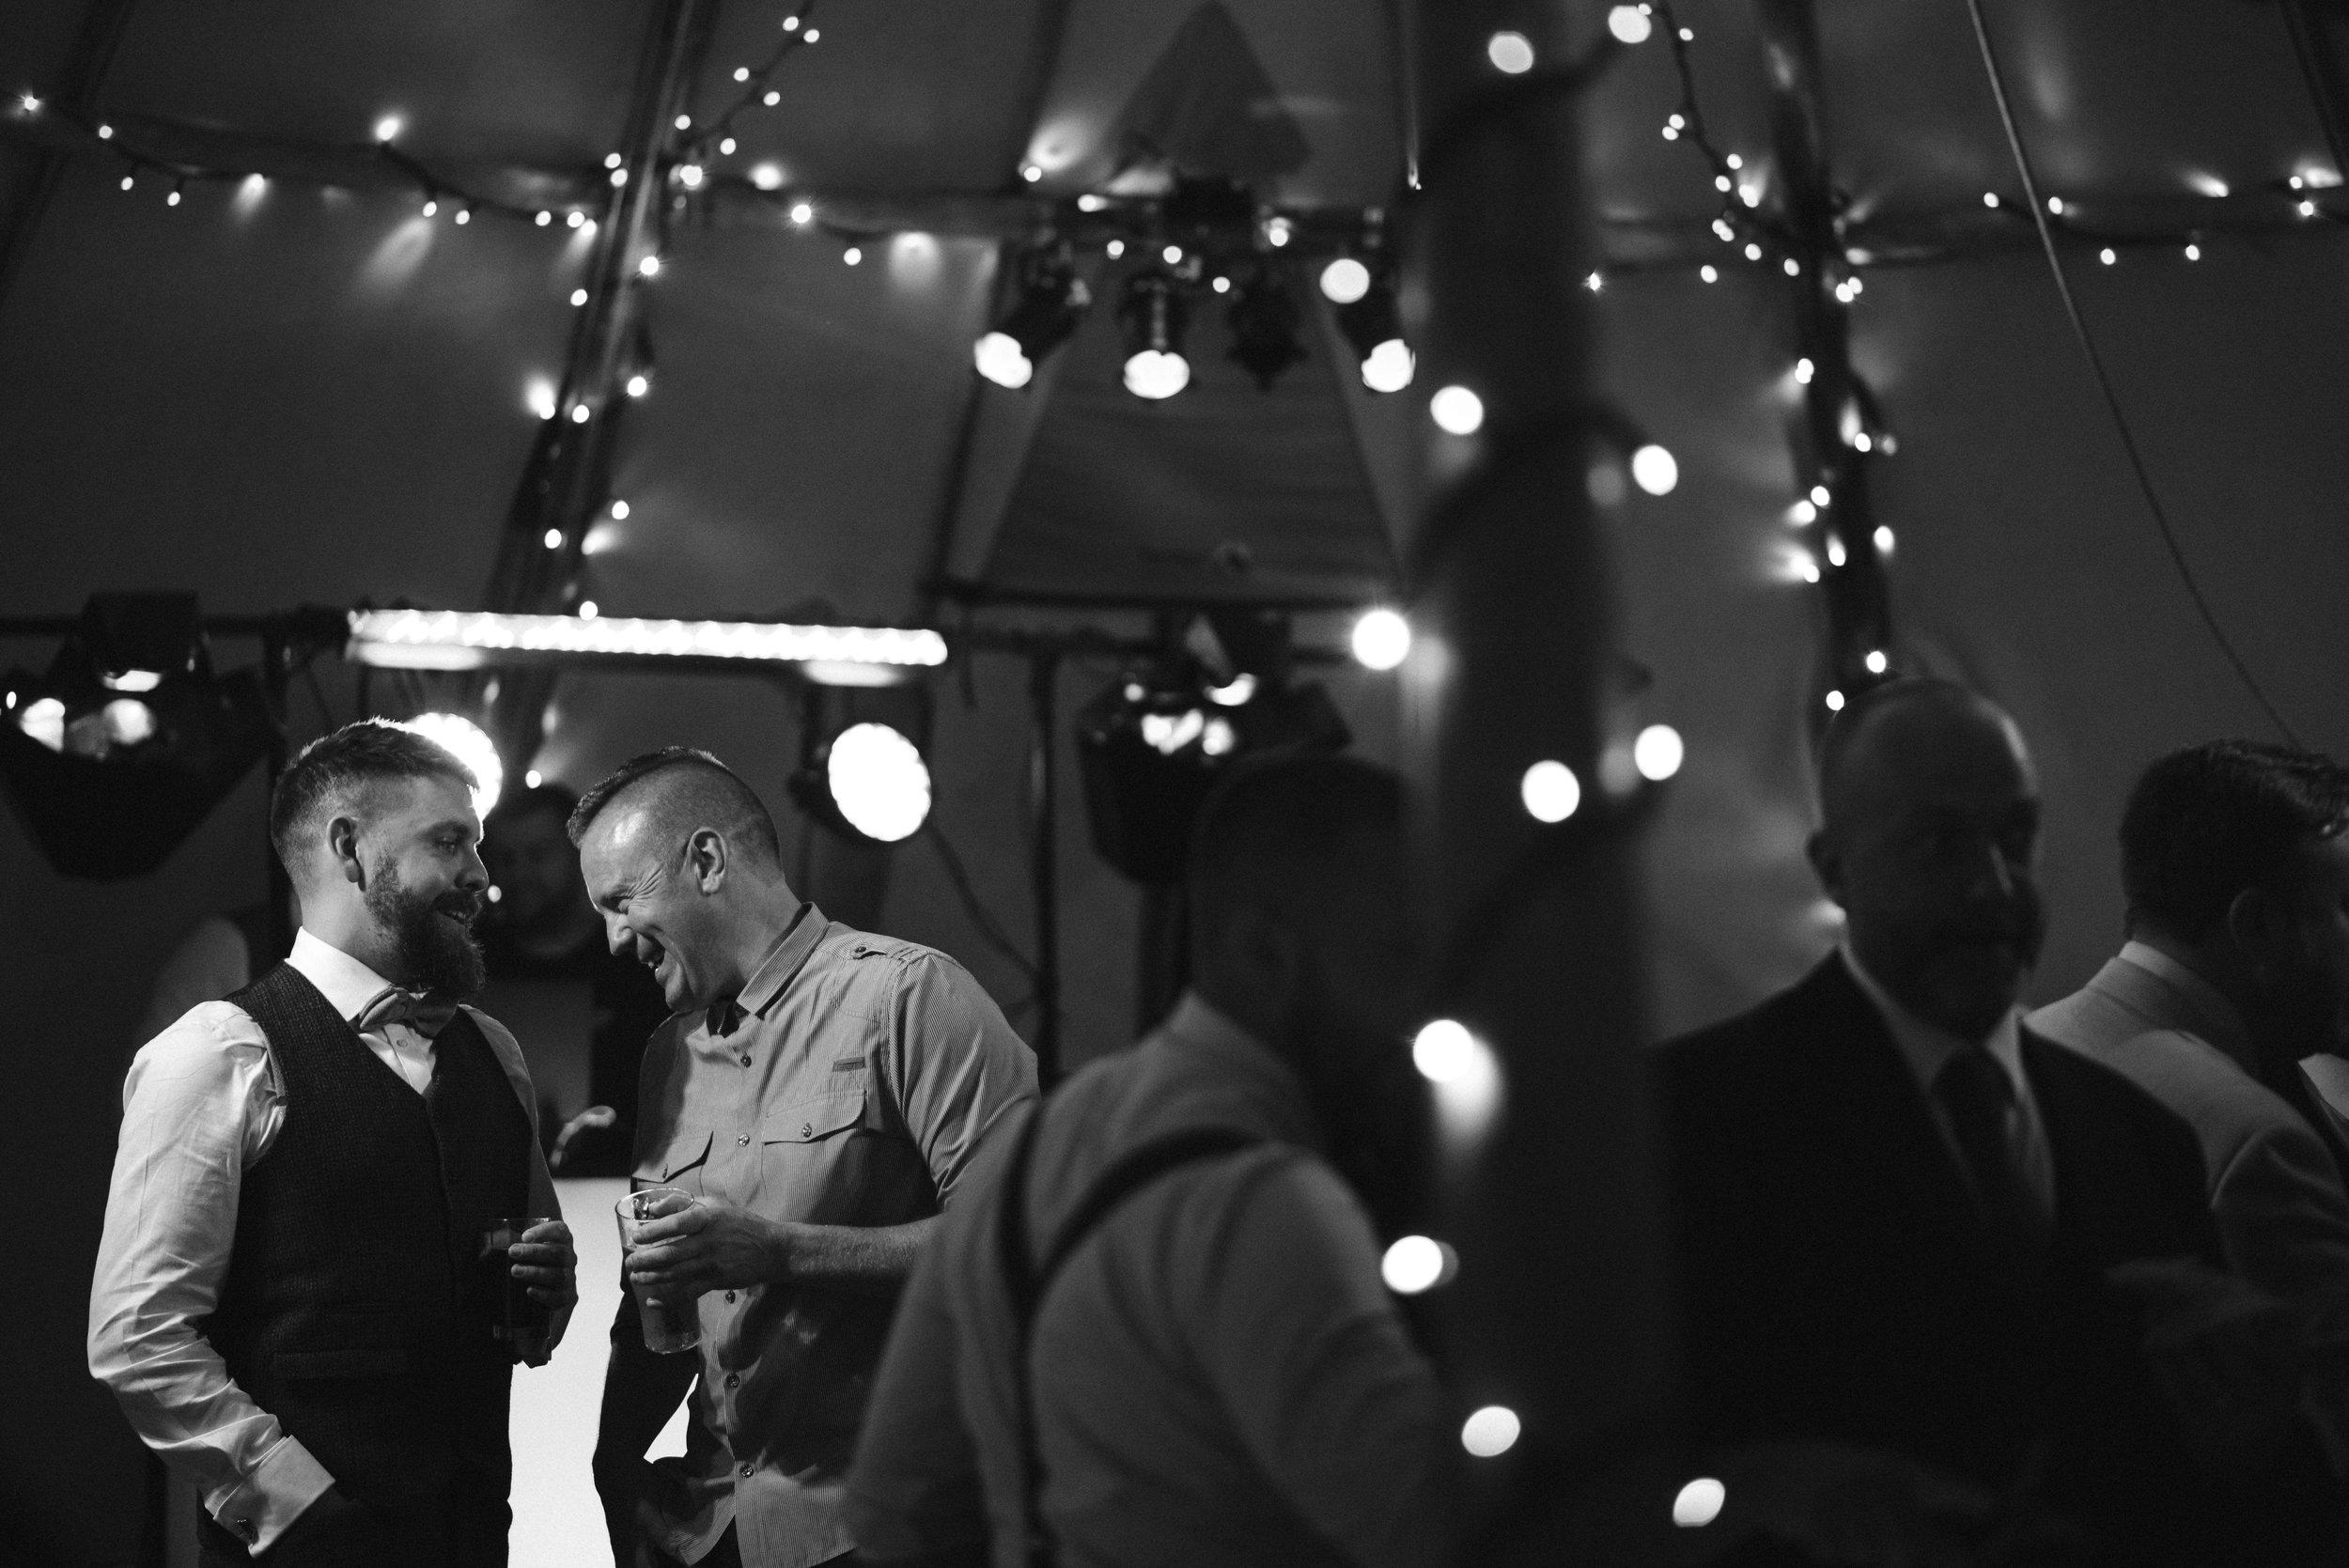 pengenna-manor-wedding-photographer-81.jpg